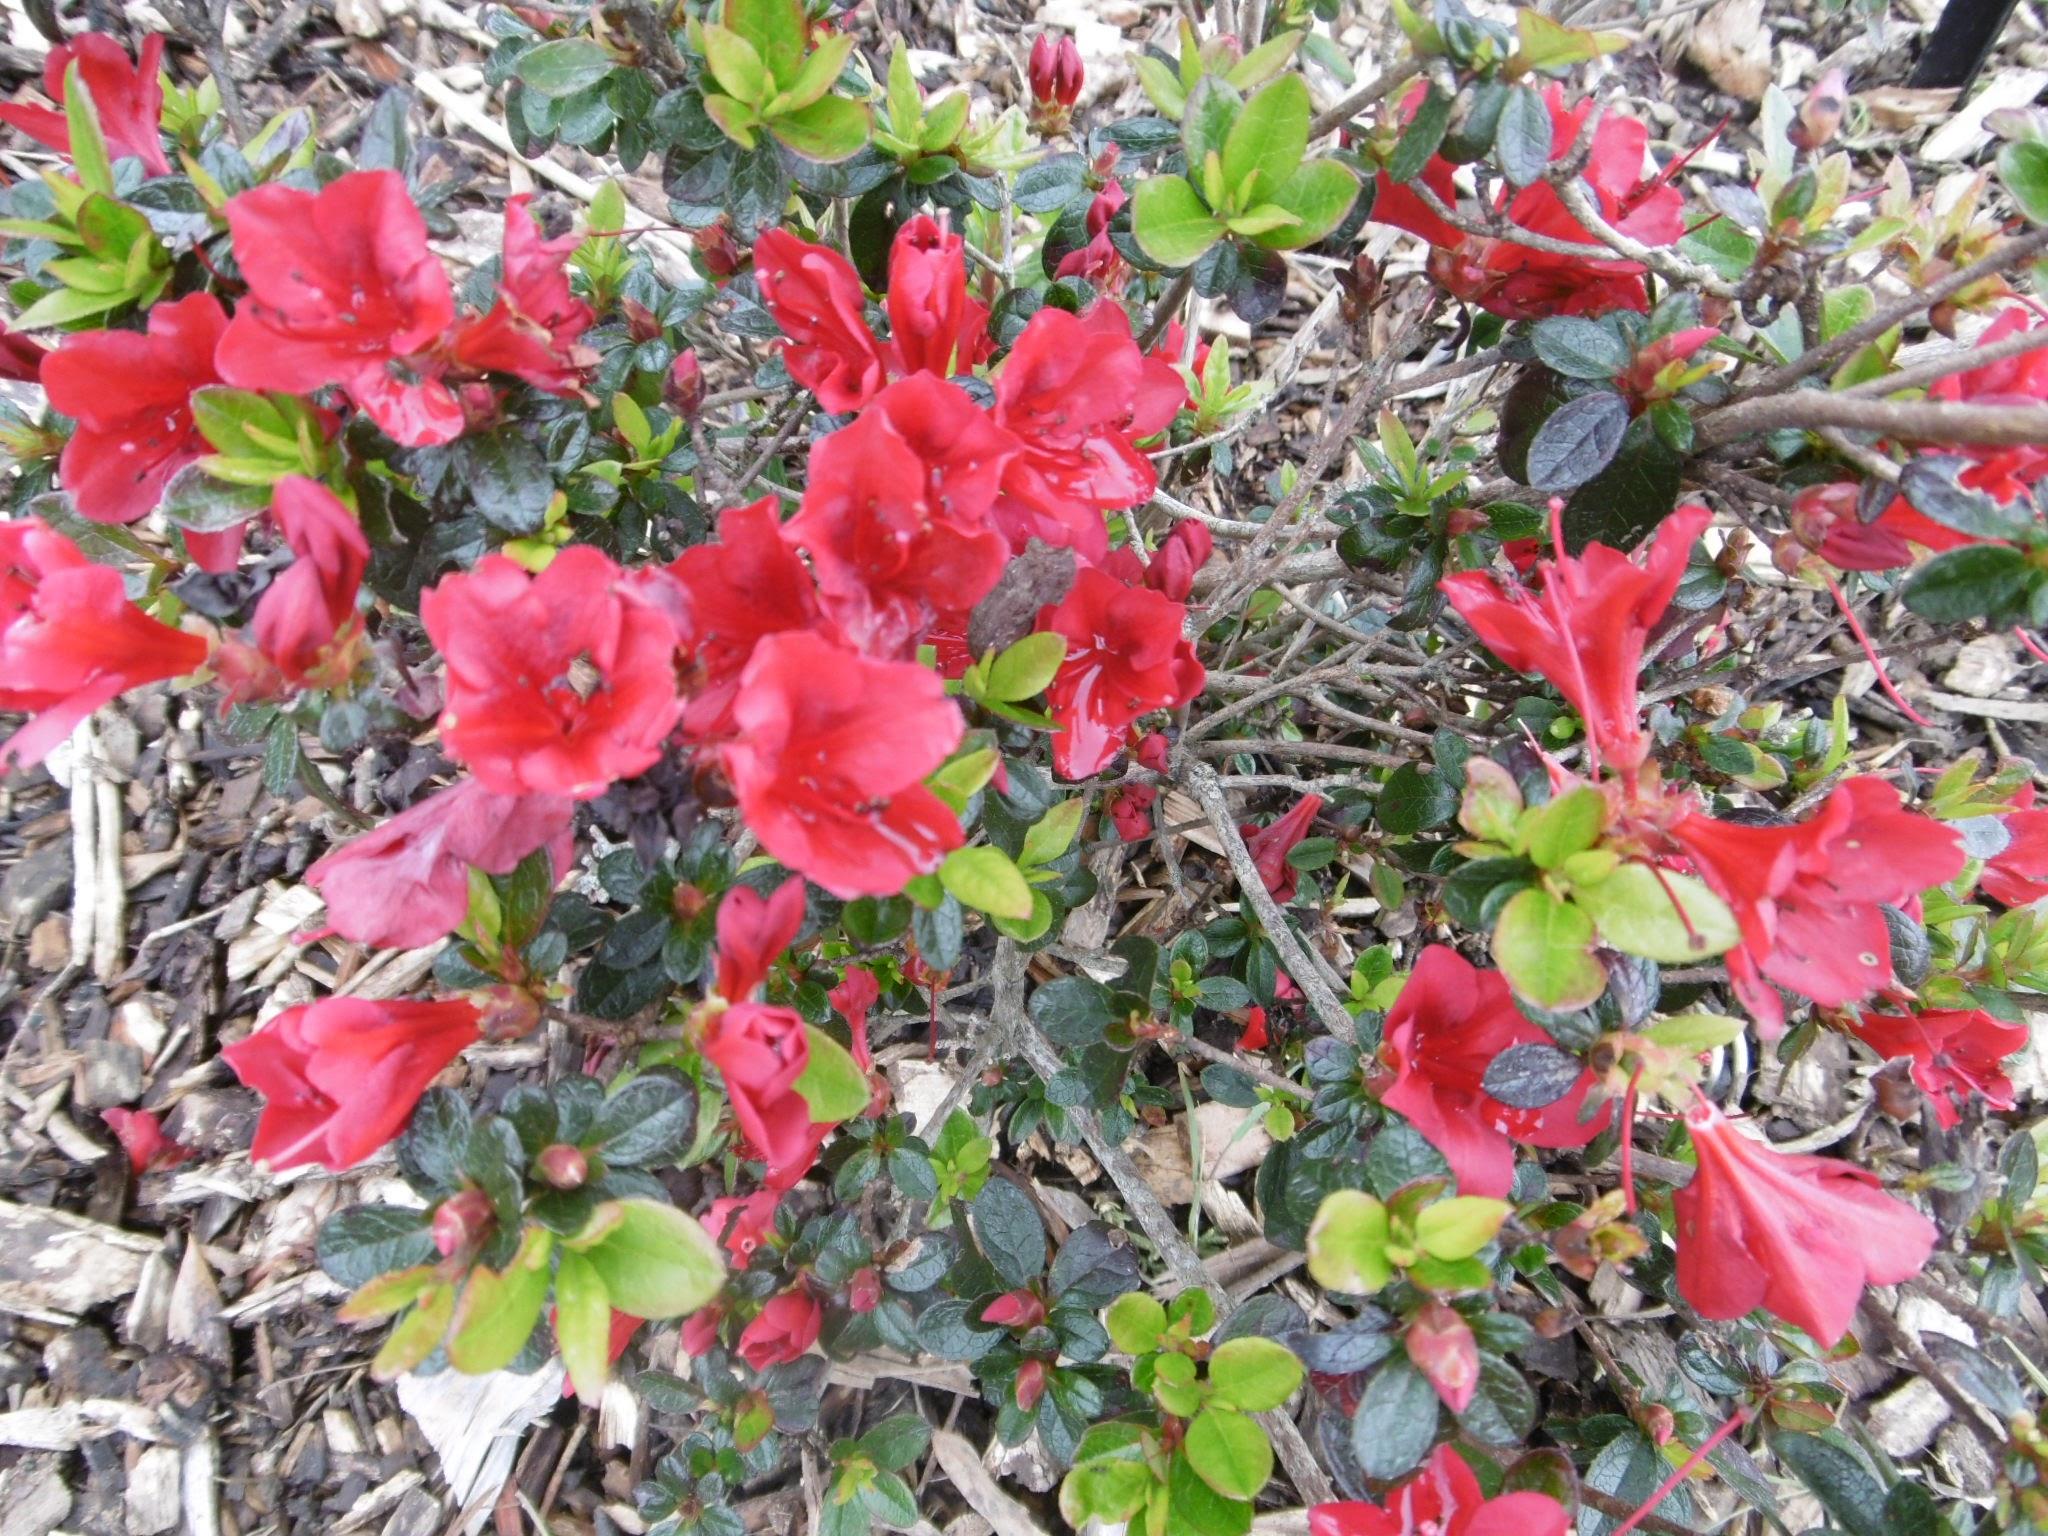 auckland-botanic-gardens-20160926-77